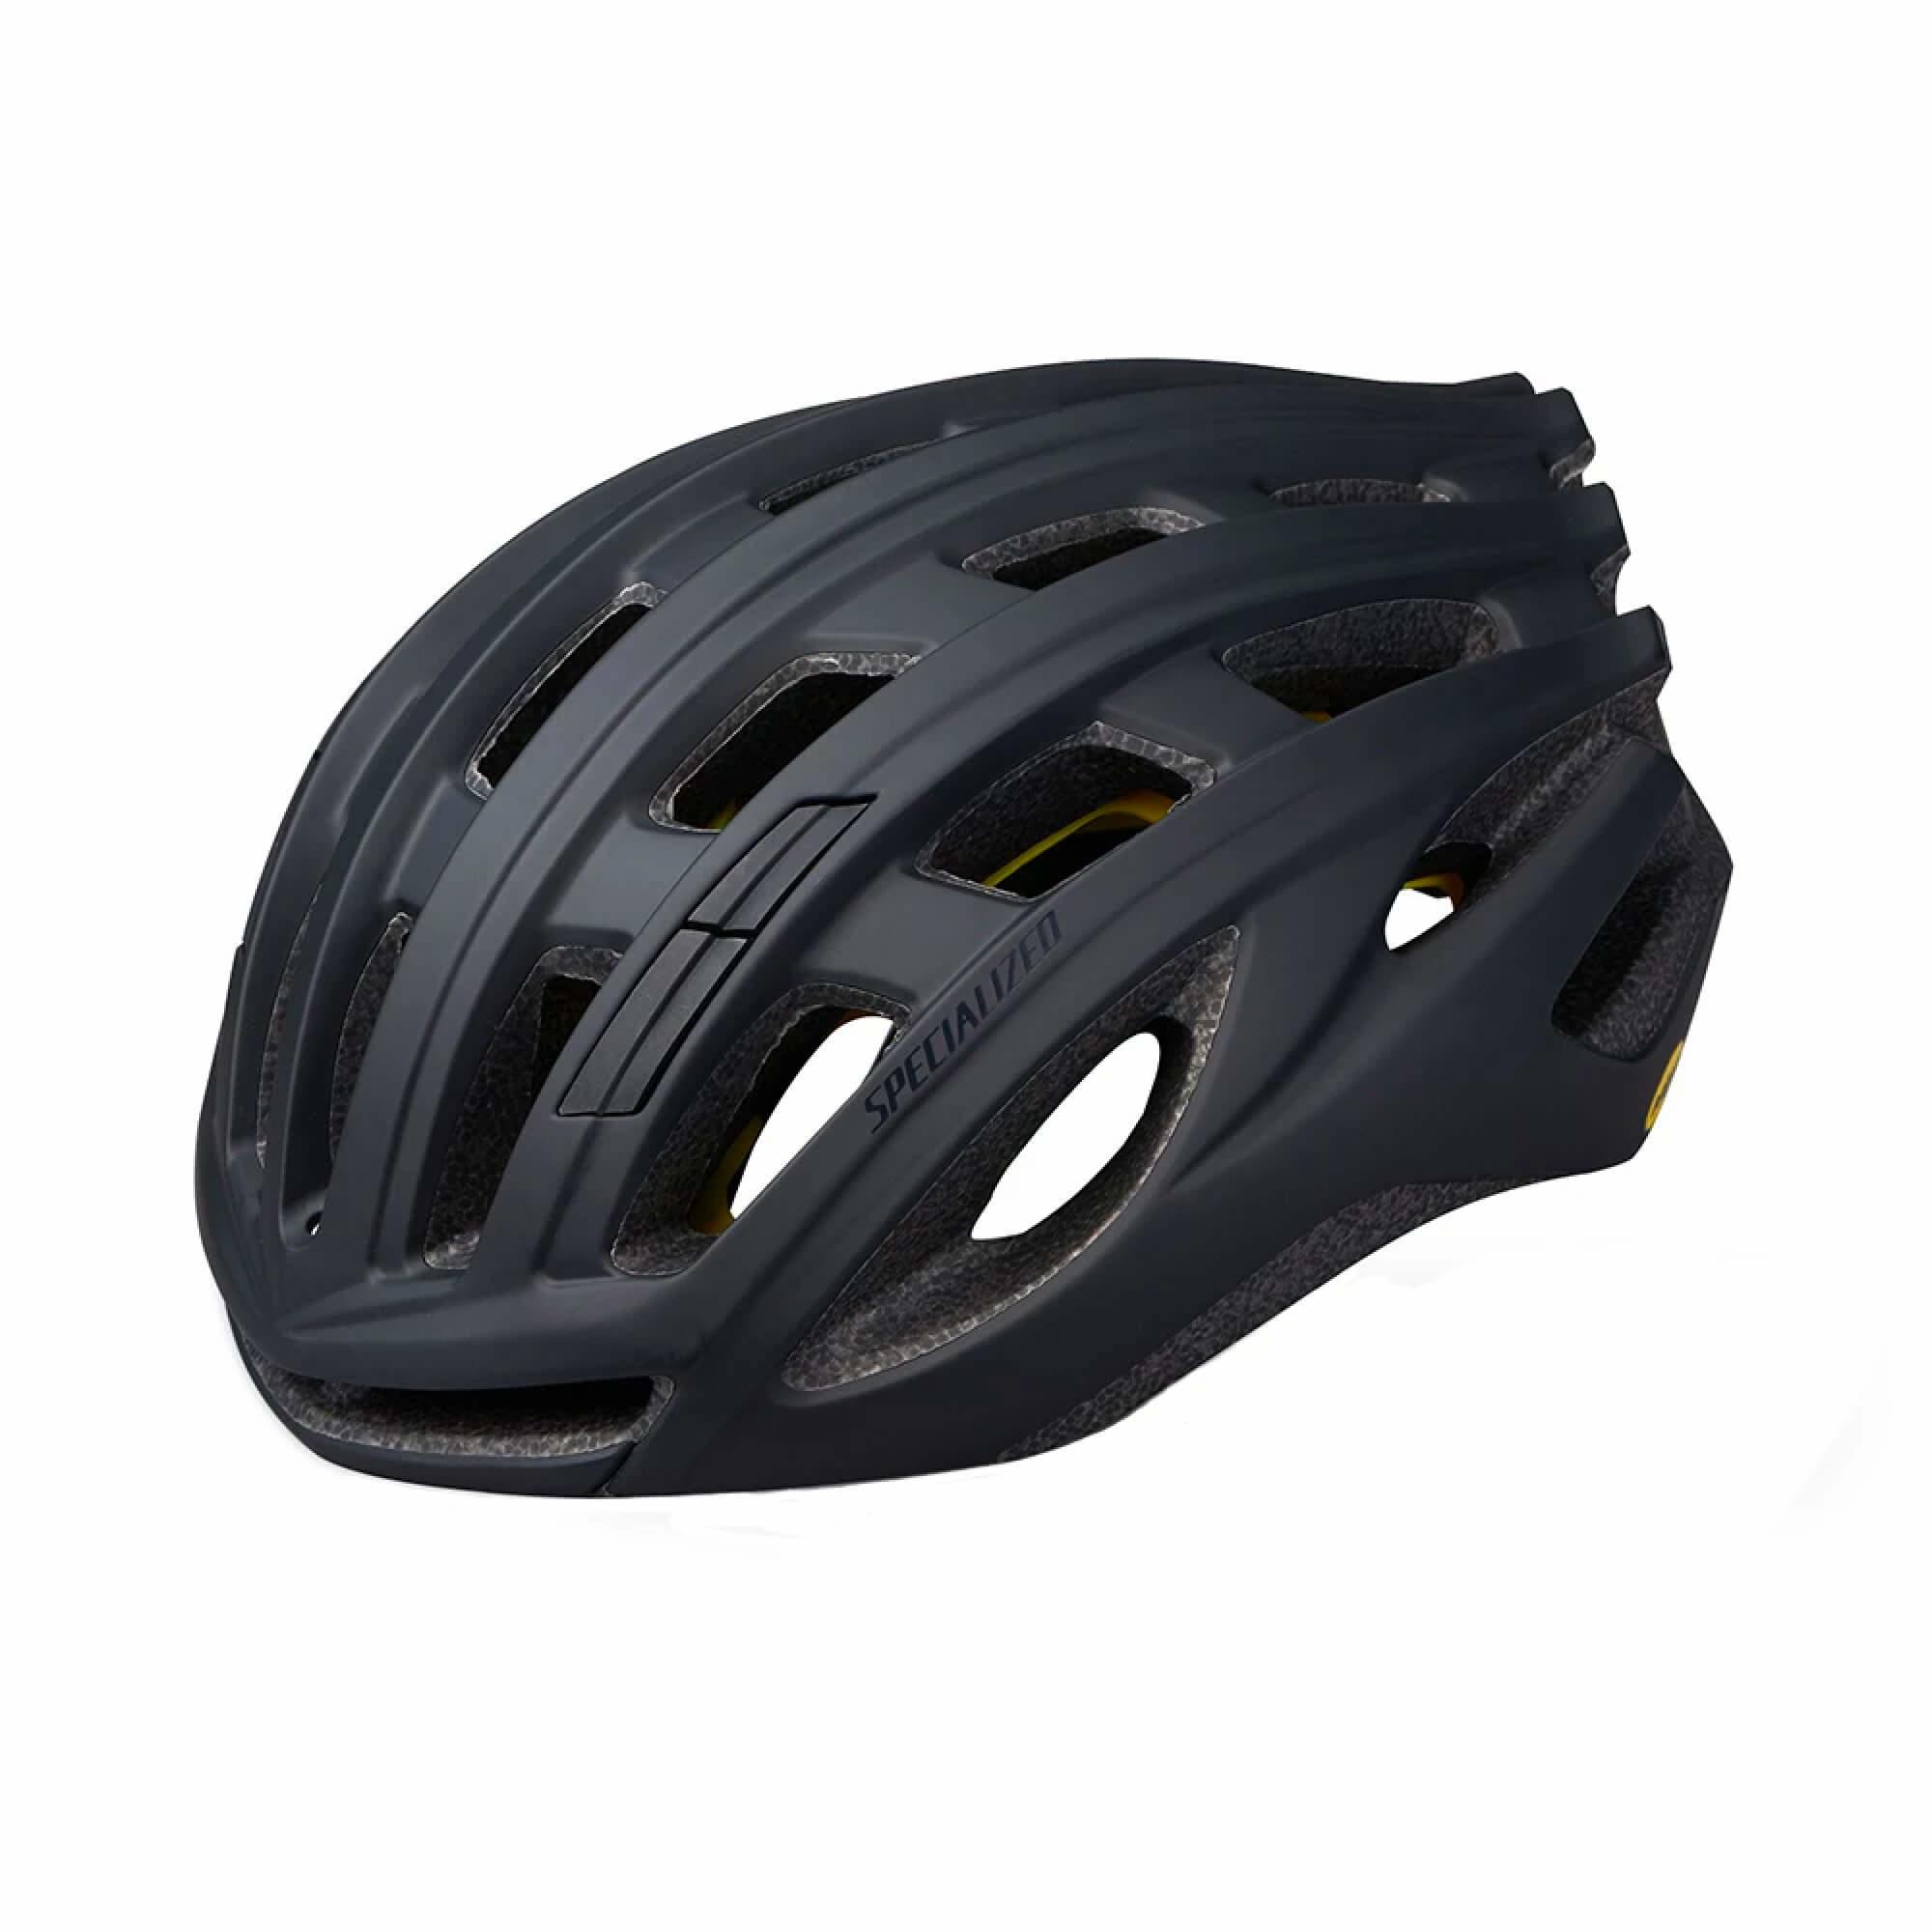 Propero 3 Helmet Angi Mips-1